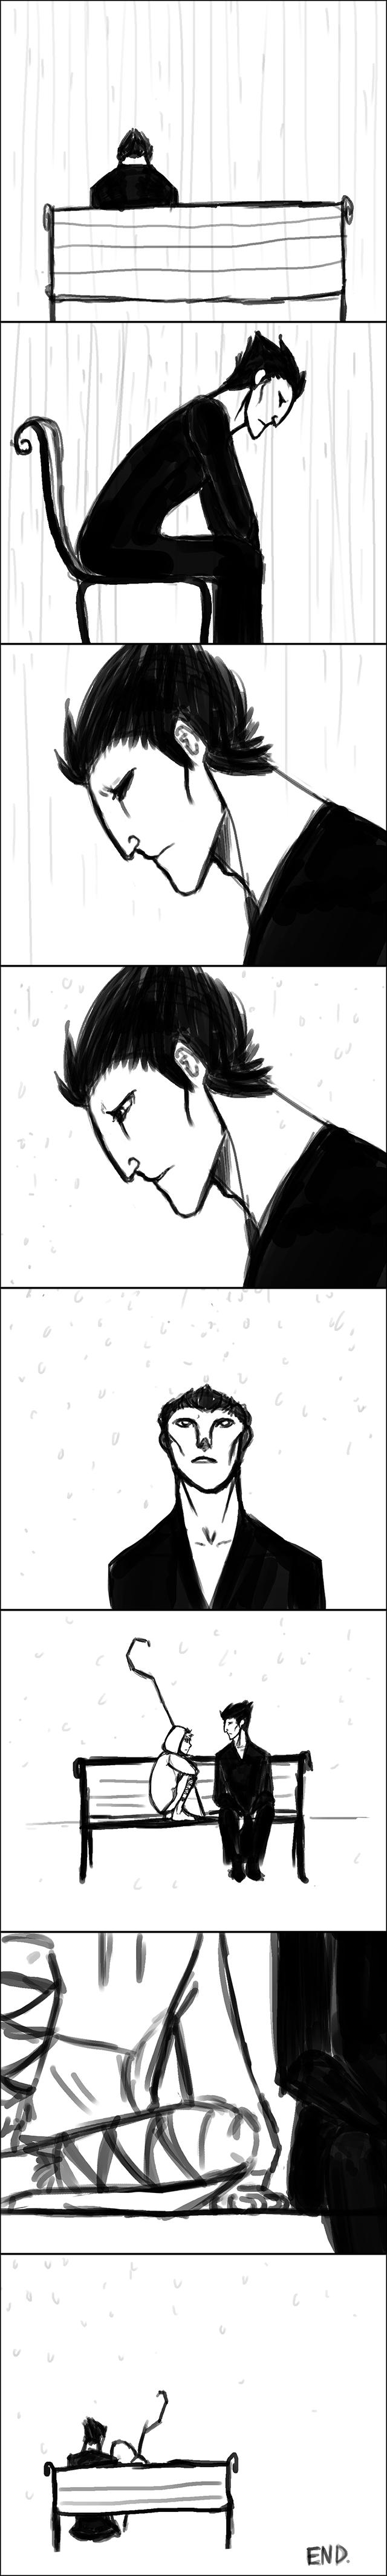 Snow by Livori